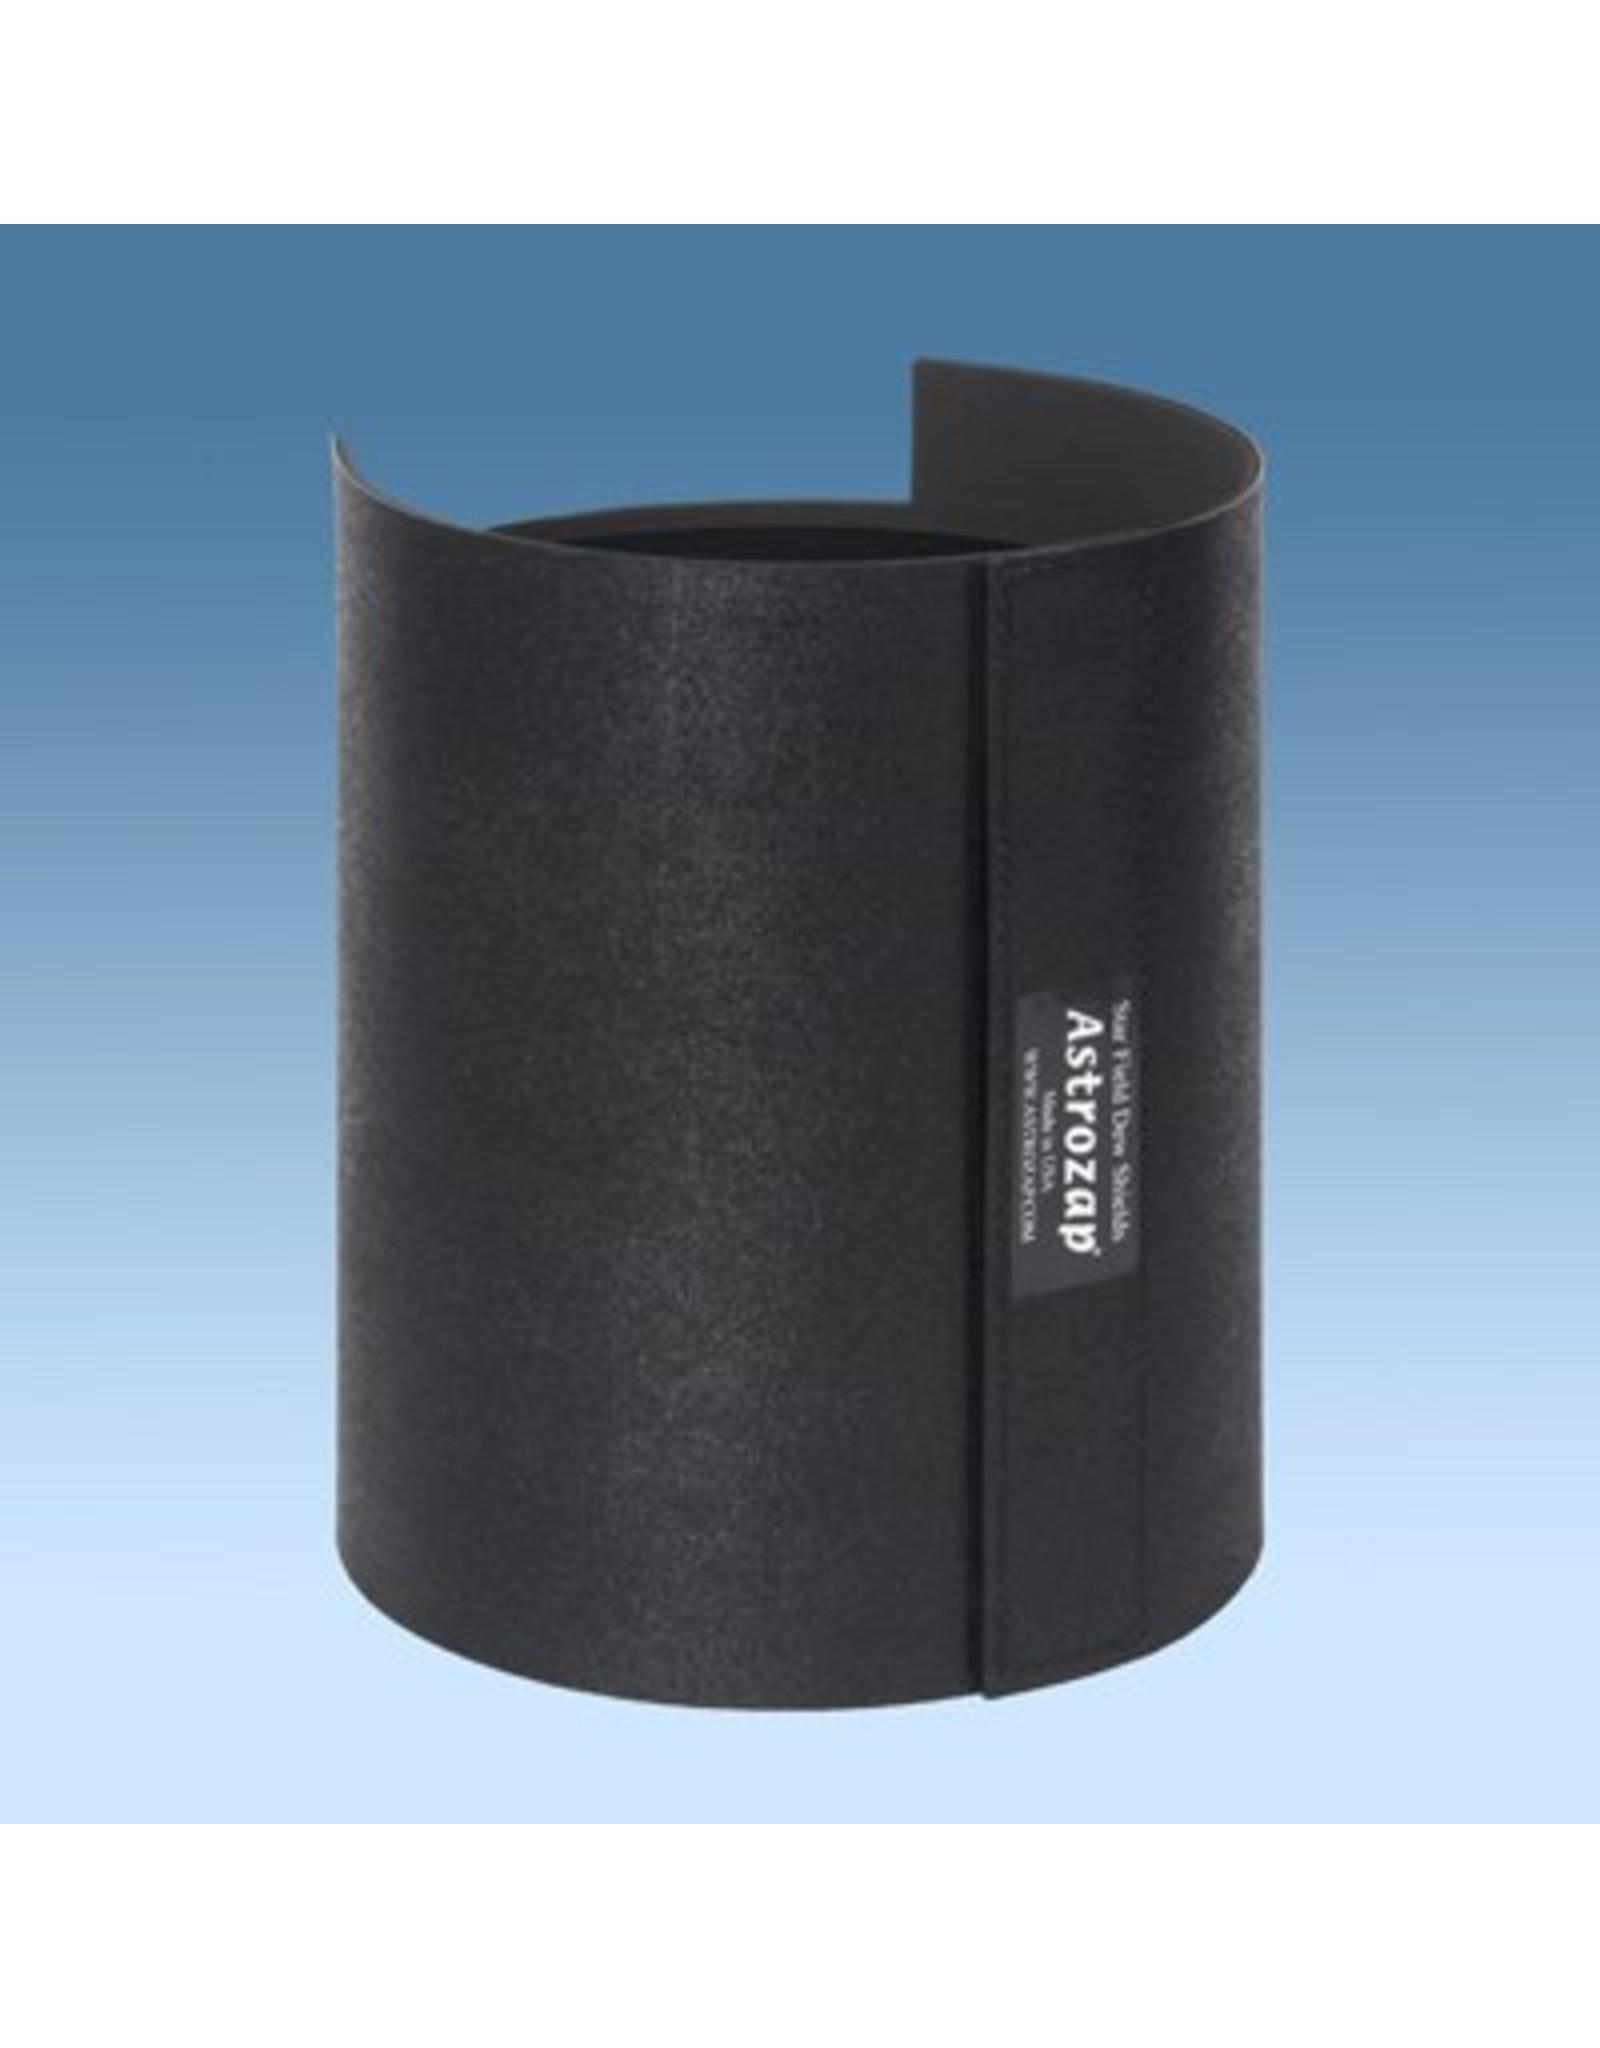 Astrozap Meade 8 ETX LS Flexi-Shield™ Flexible Dew Shield